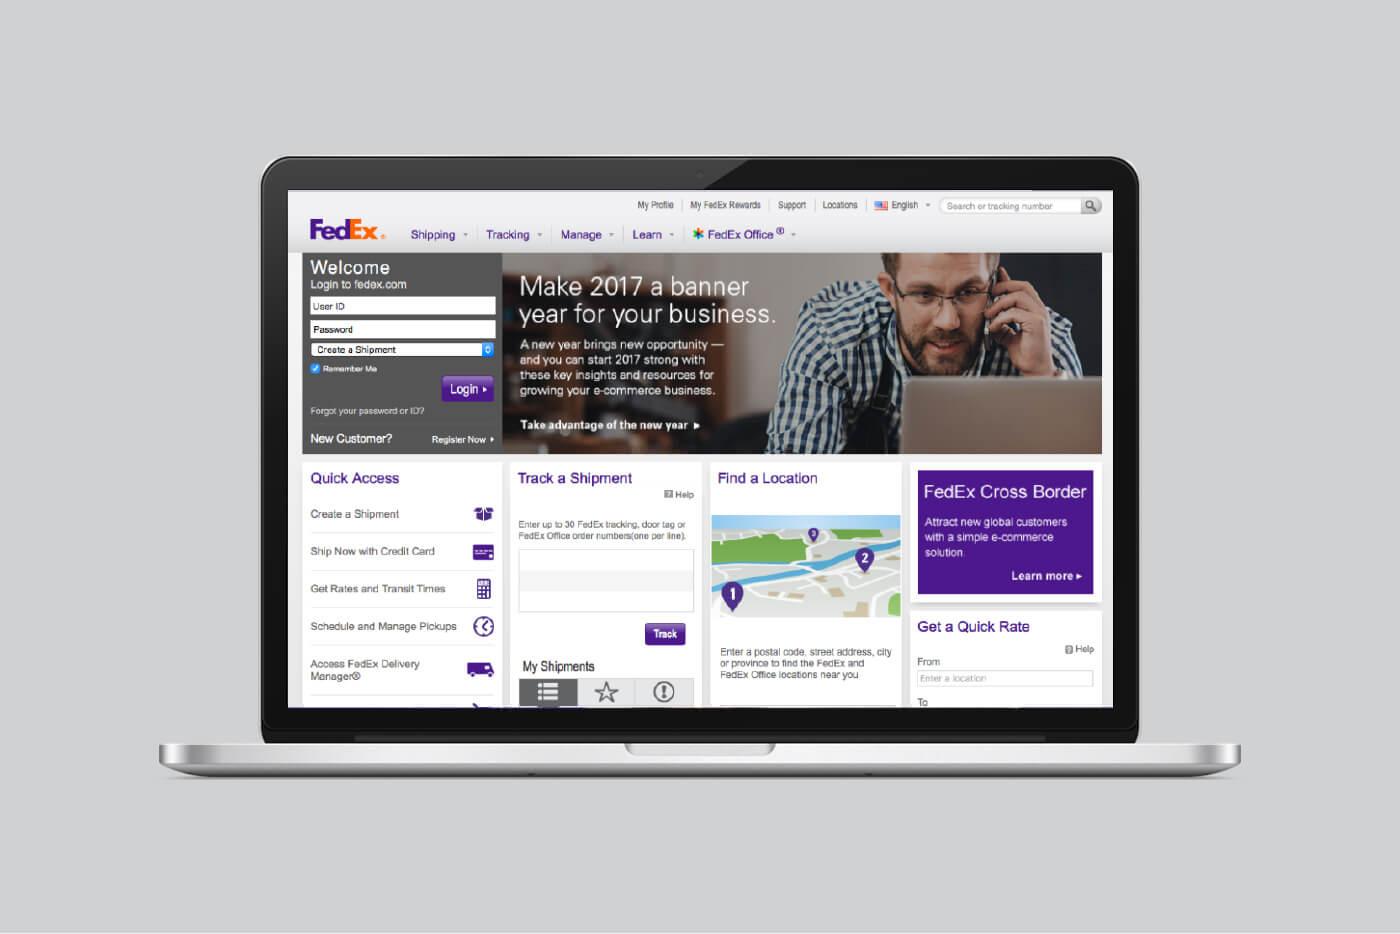 old-fedex-website